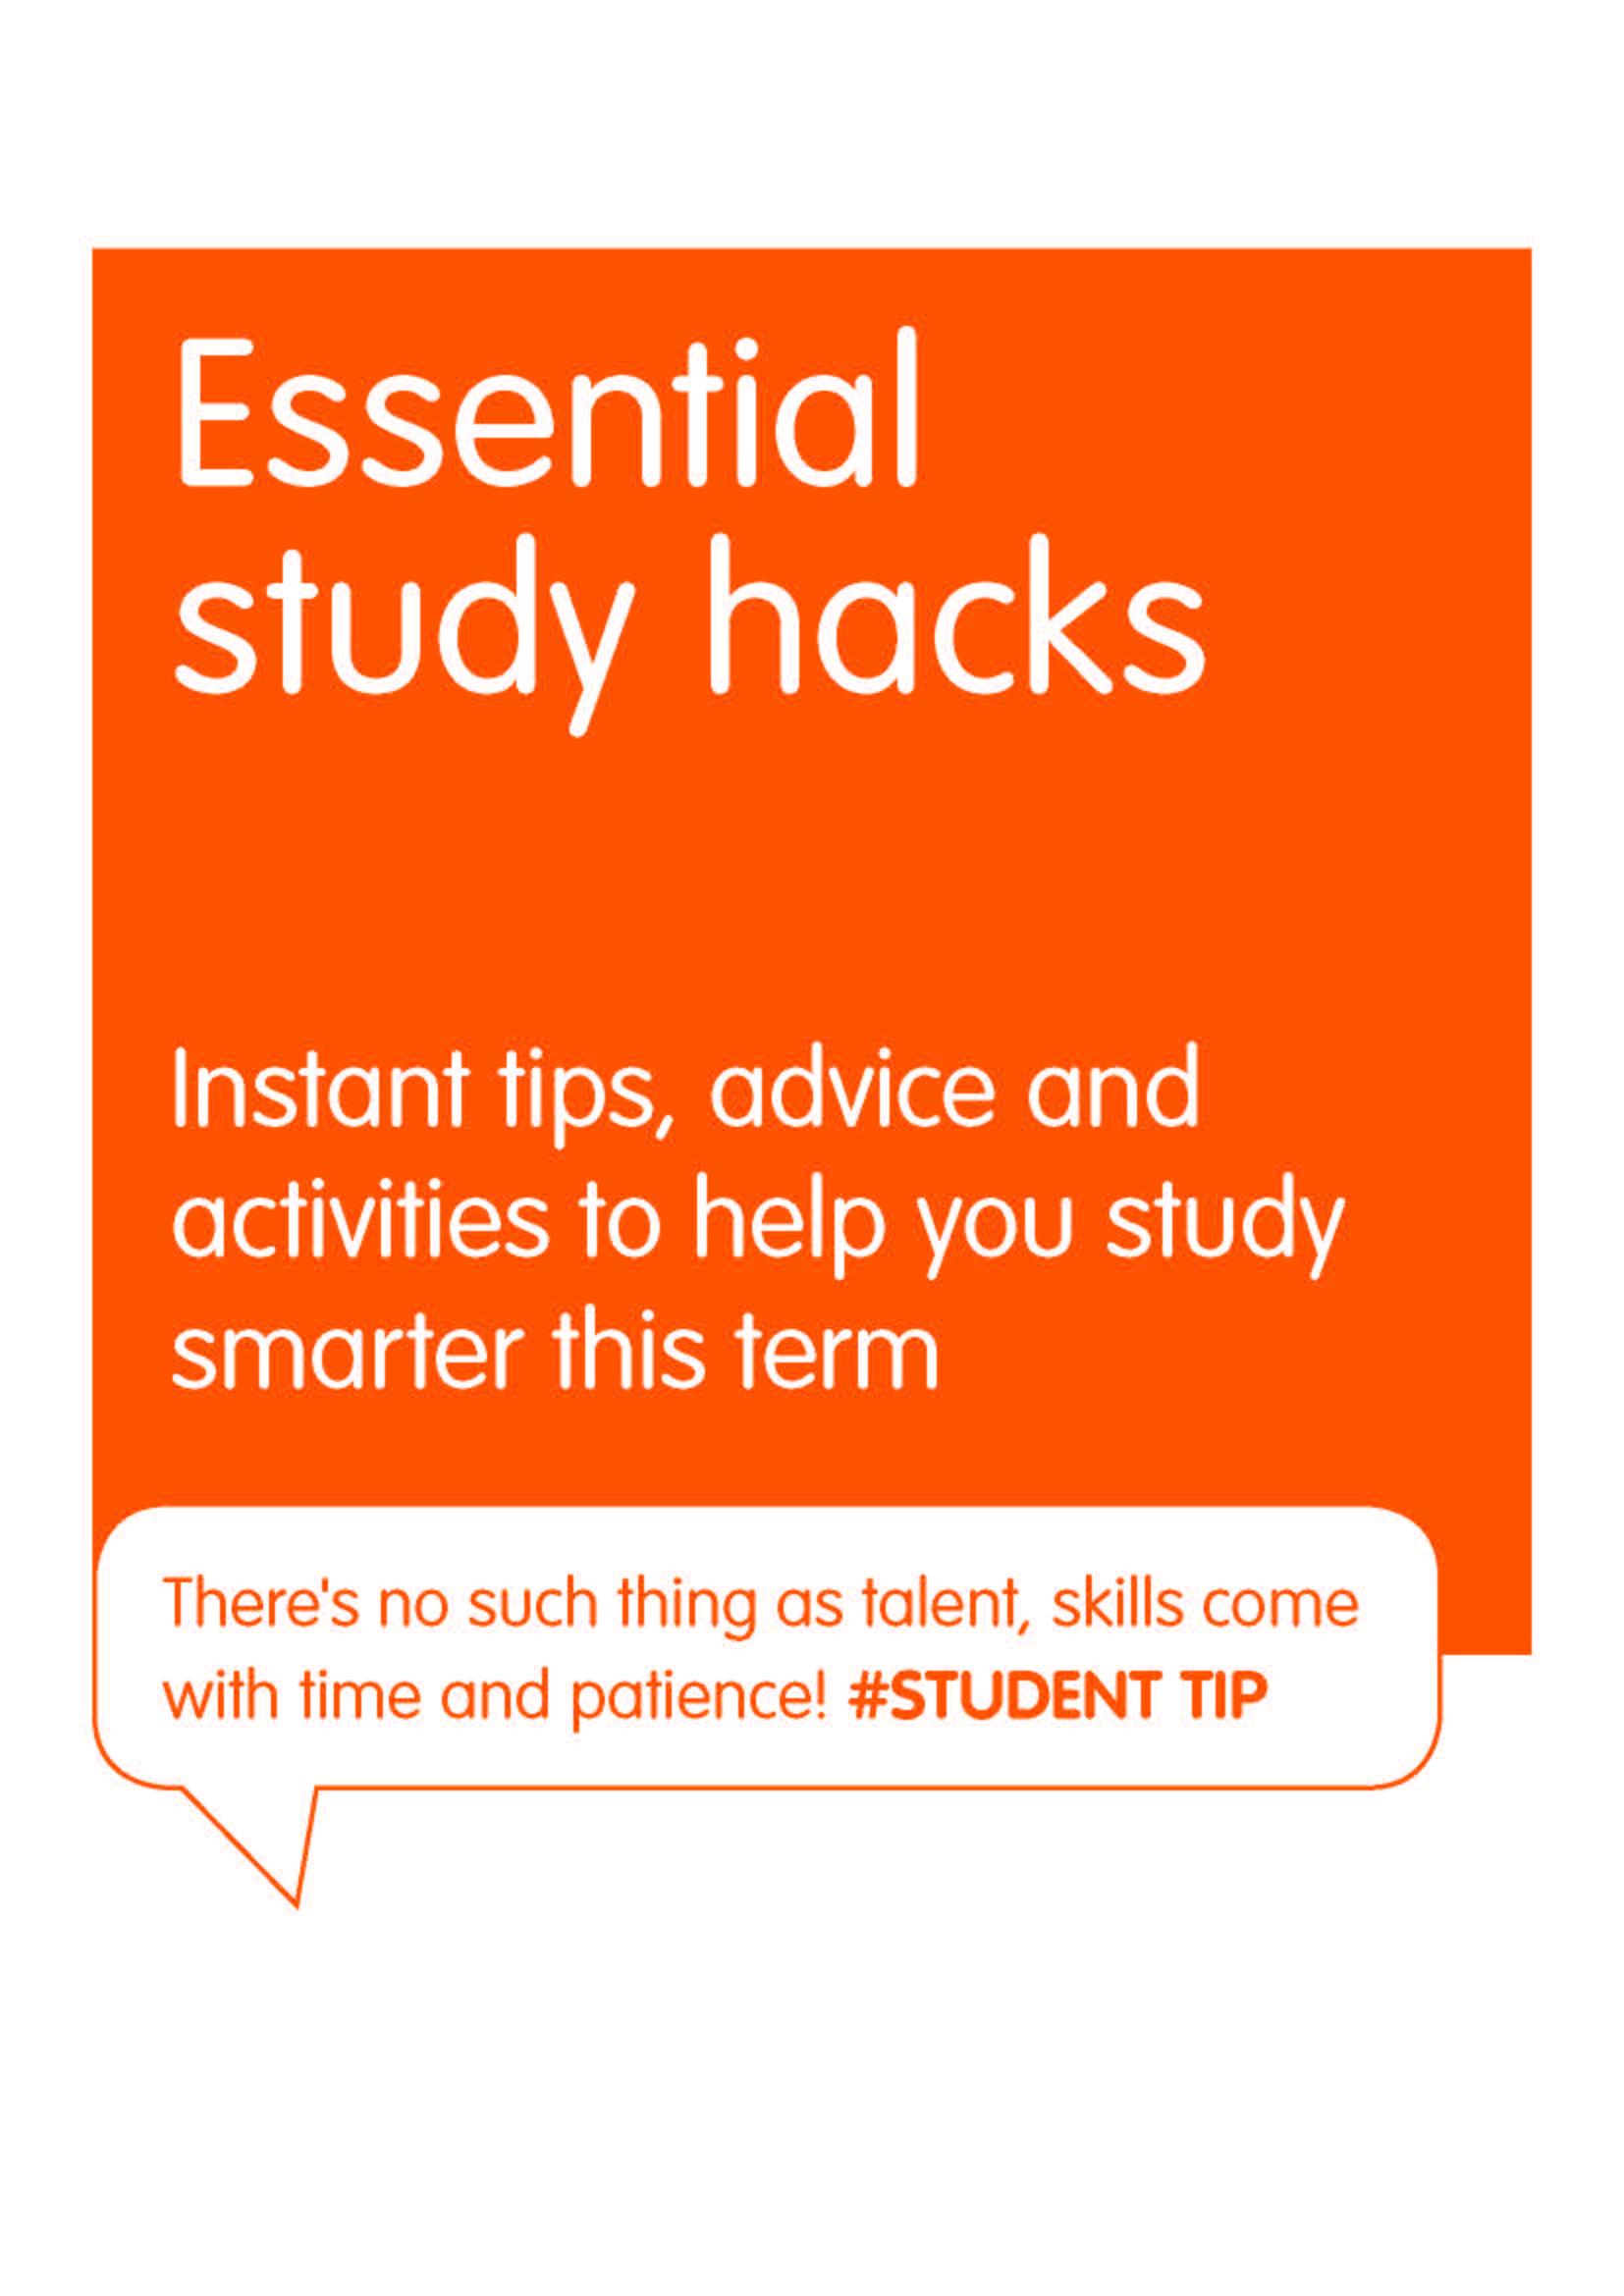 Download the free study hacks eBooks